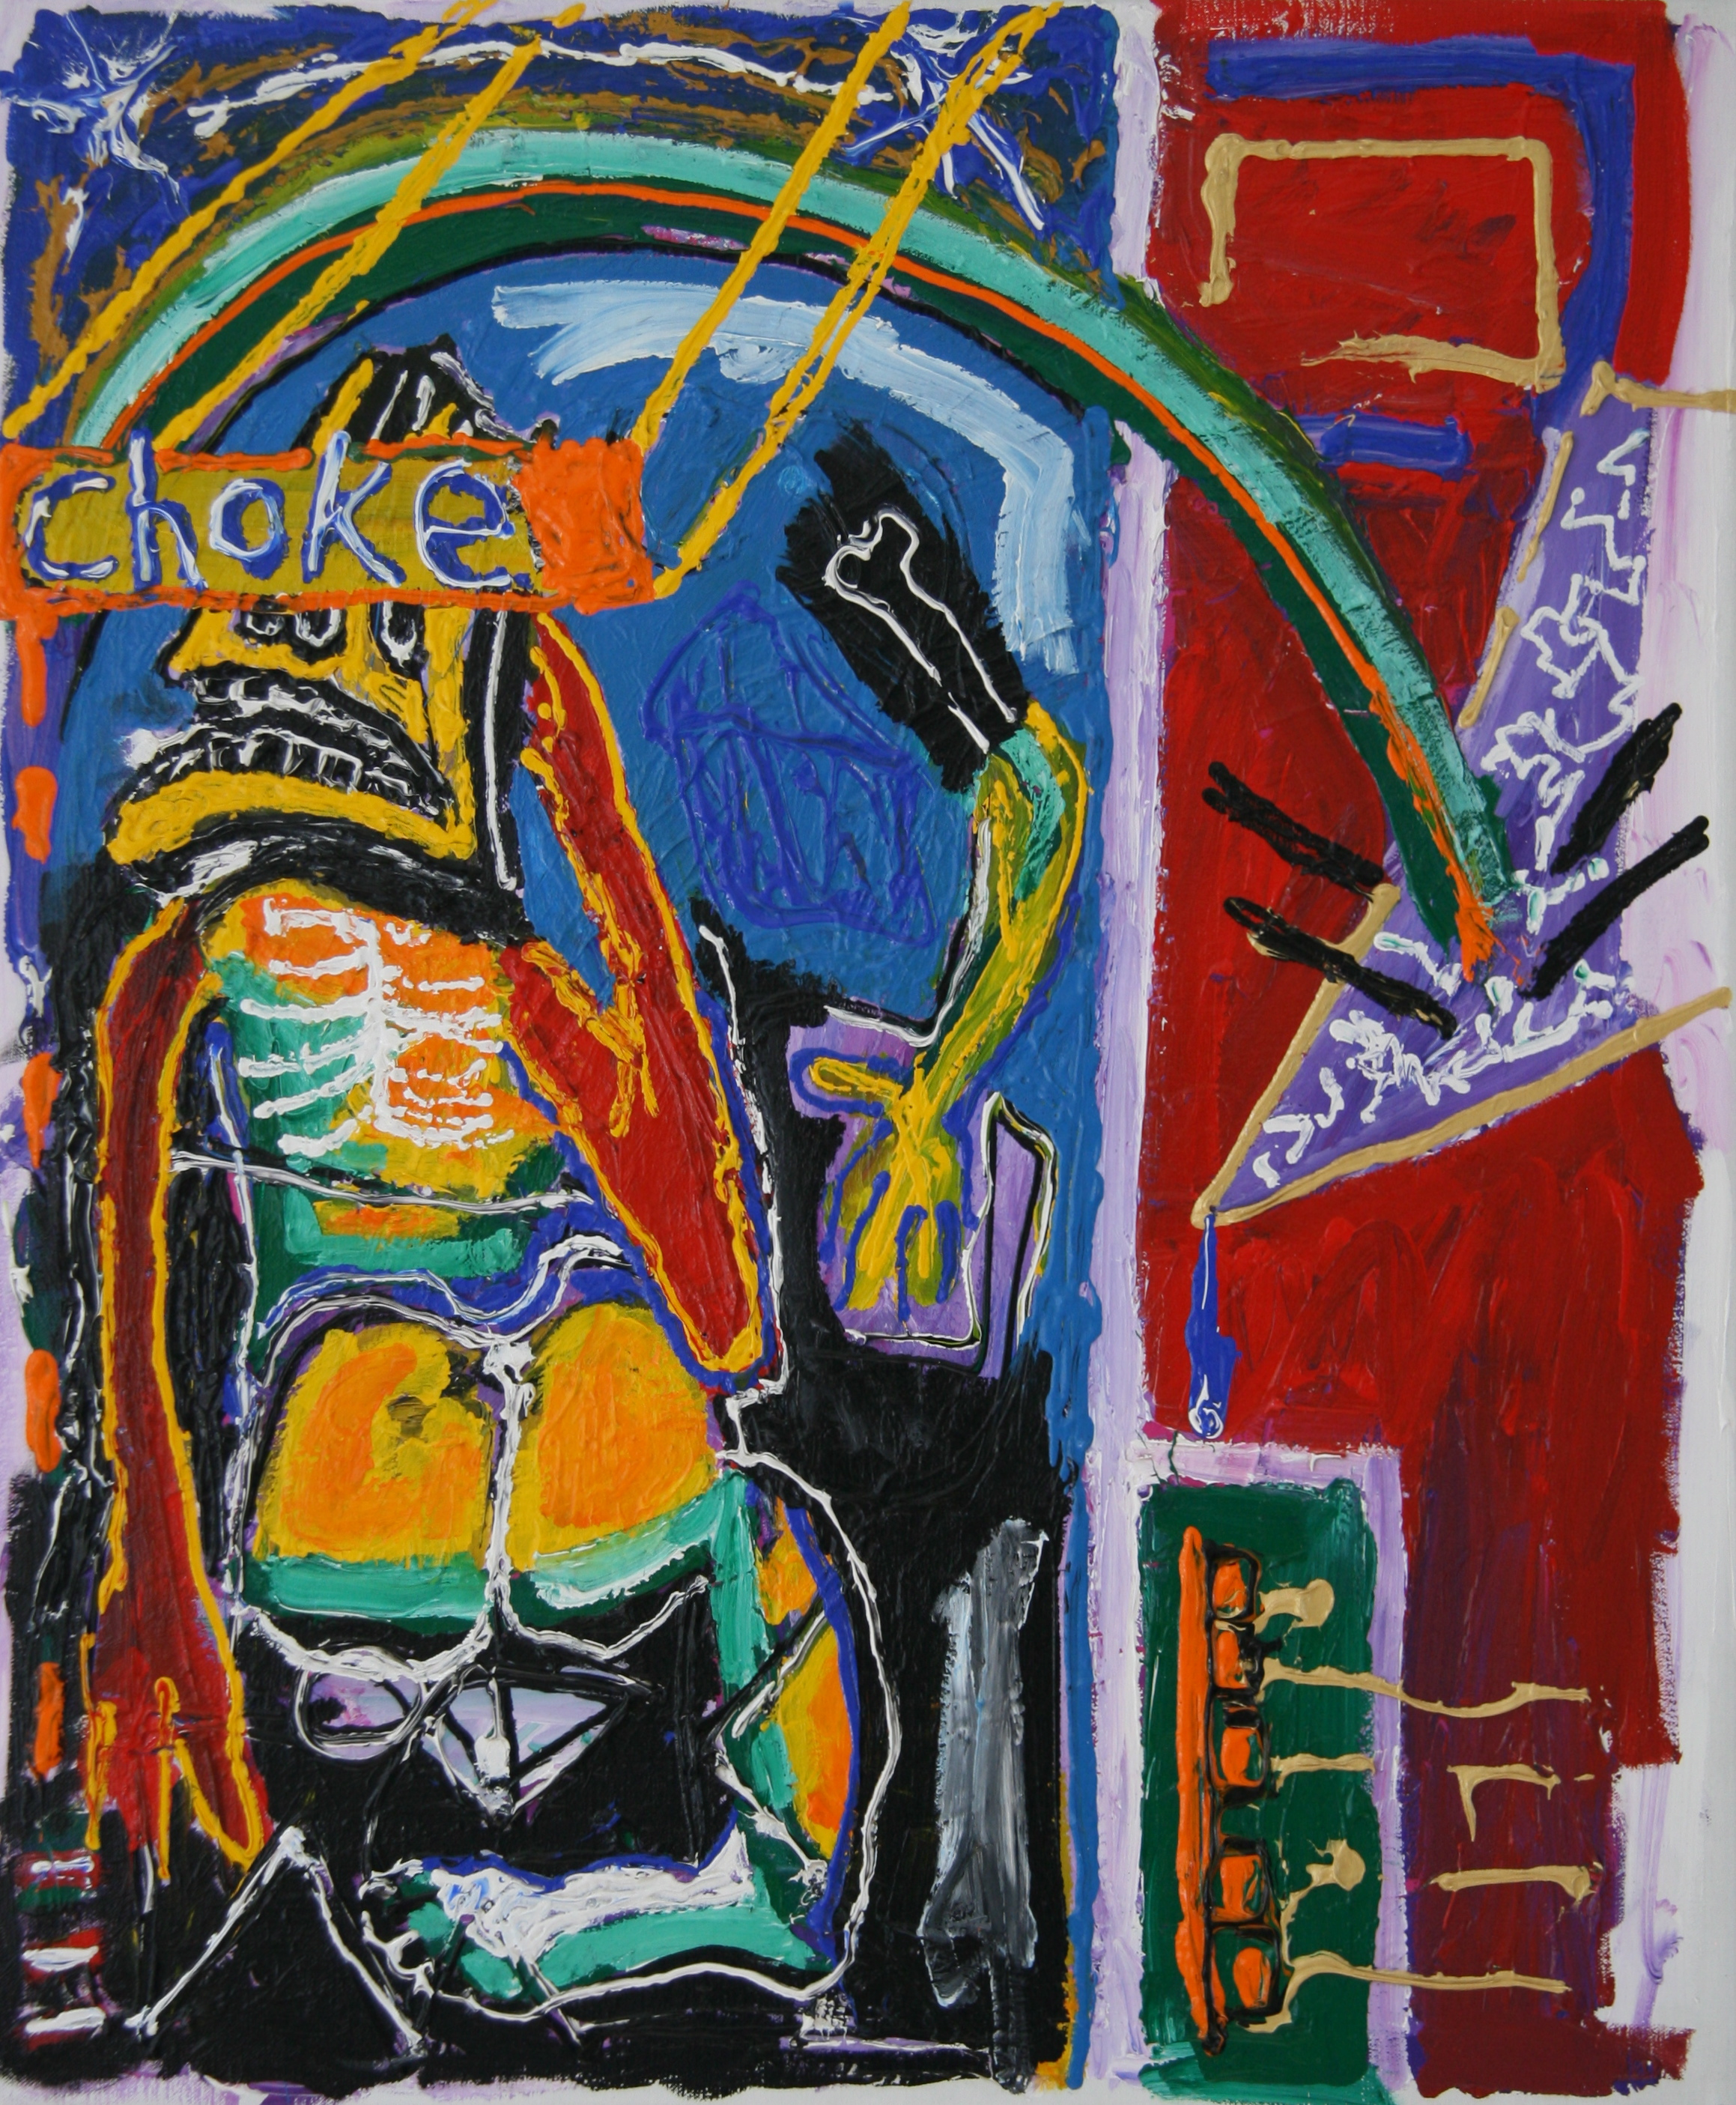 no title, 60x50cm, acrylic on canvas